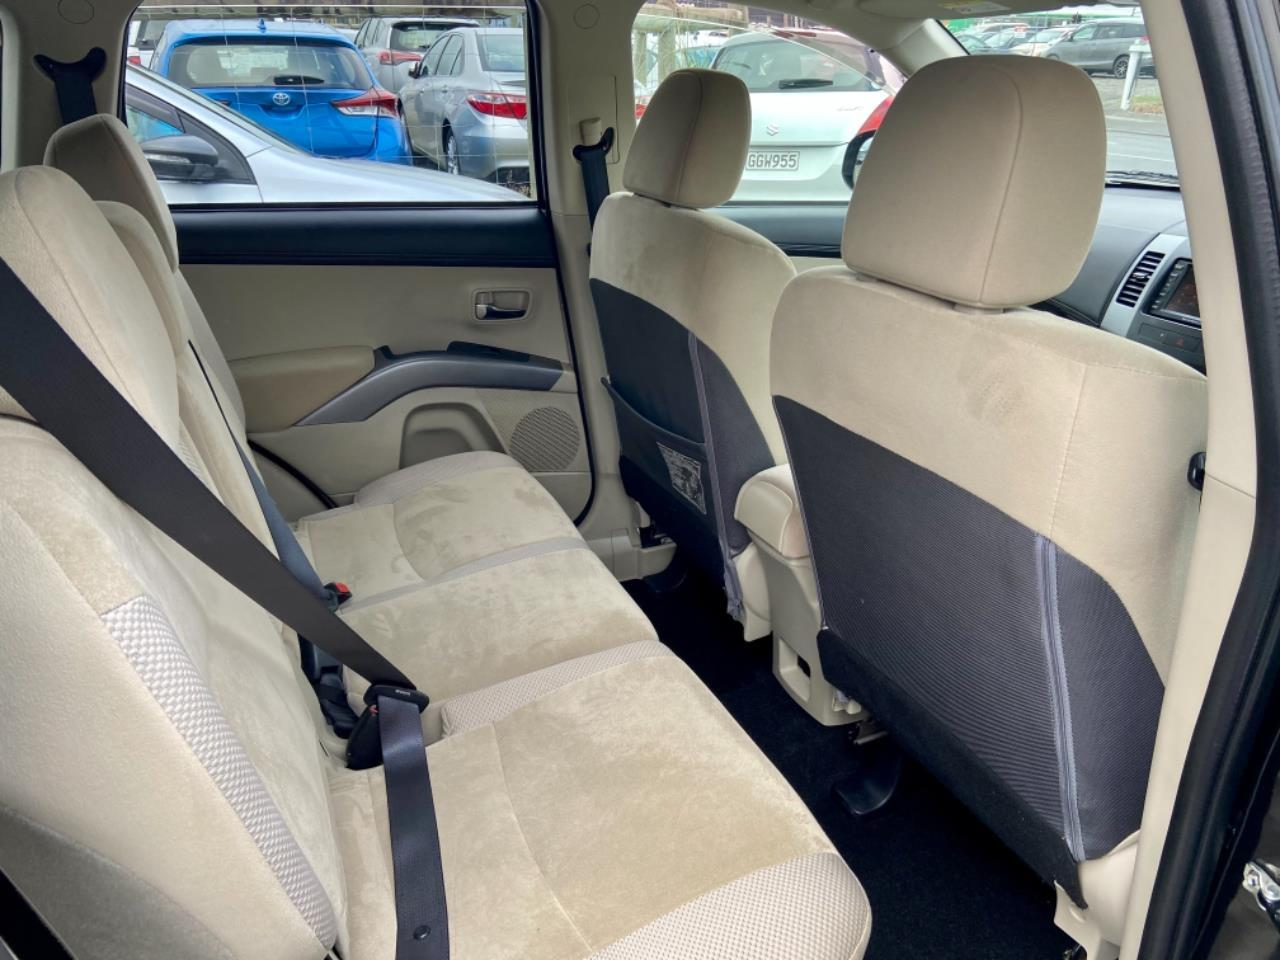 image-15, 2010 Mitsubishi Outlander 24G 4WD 7 Seater Facelif at Christchurch